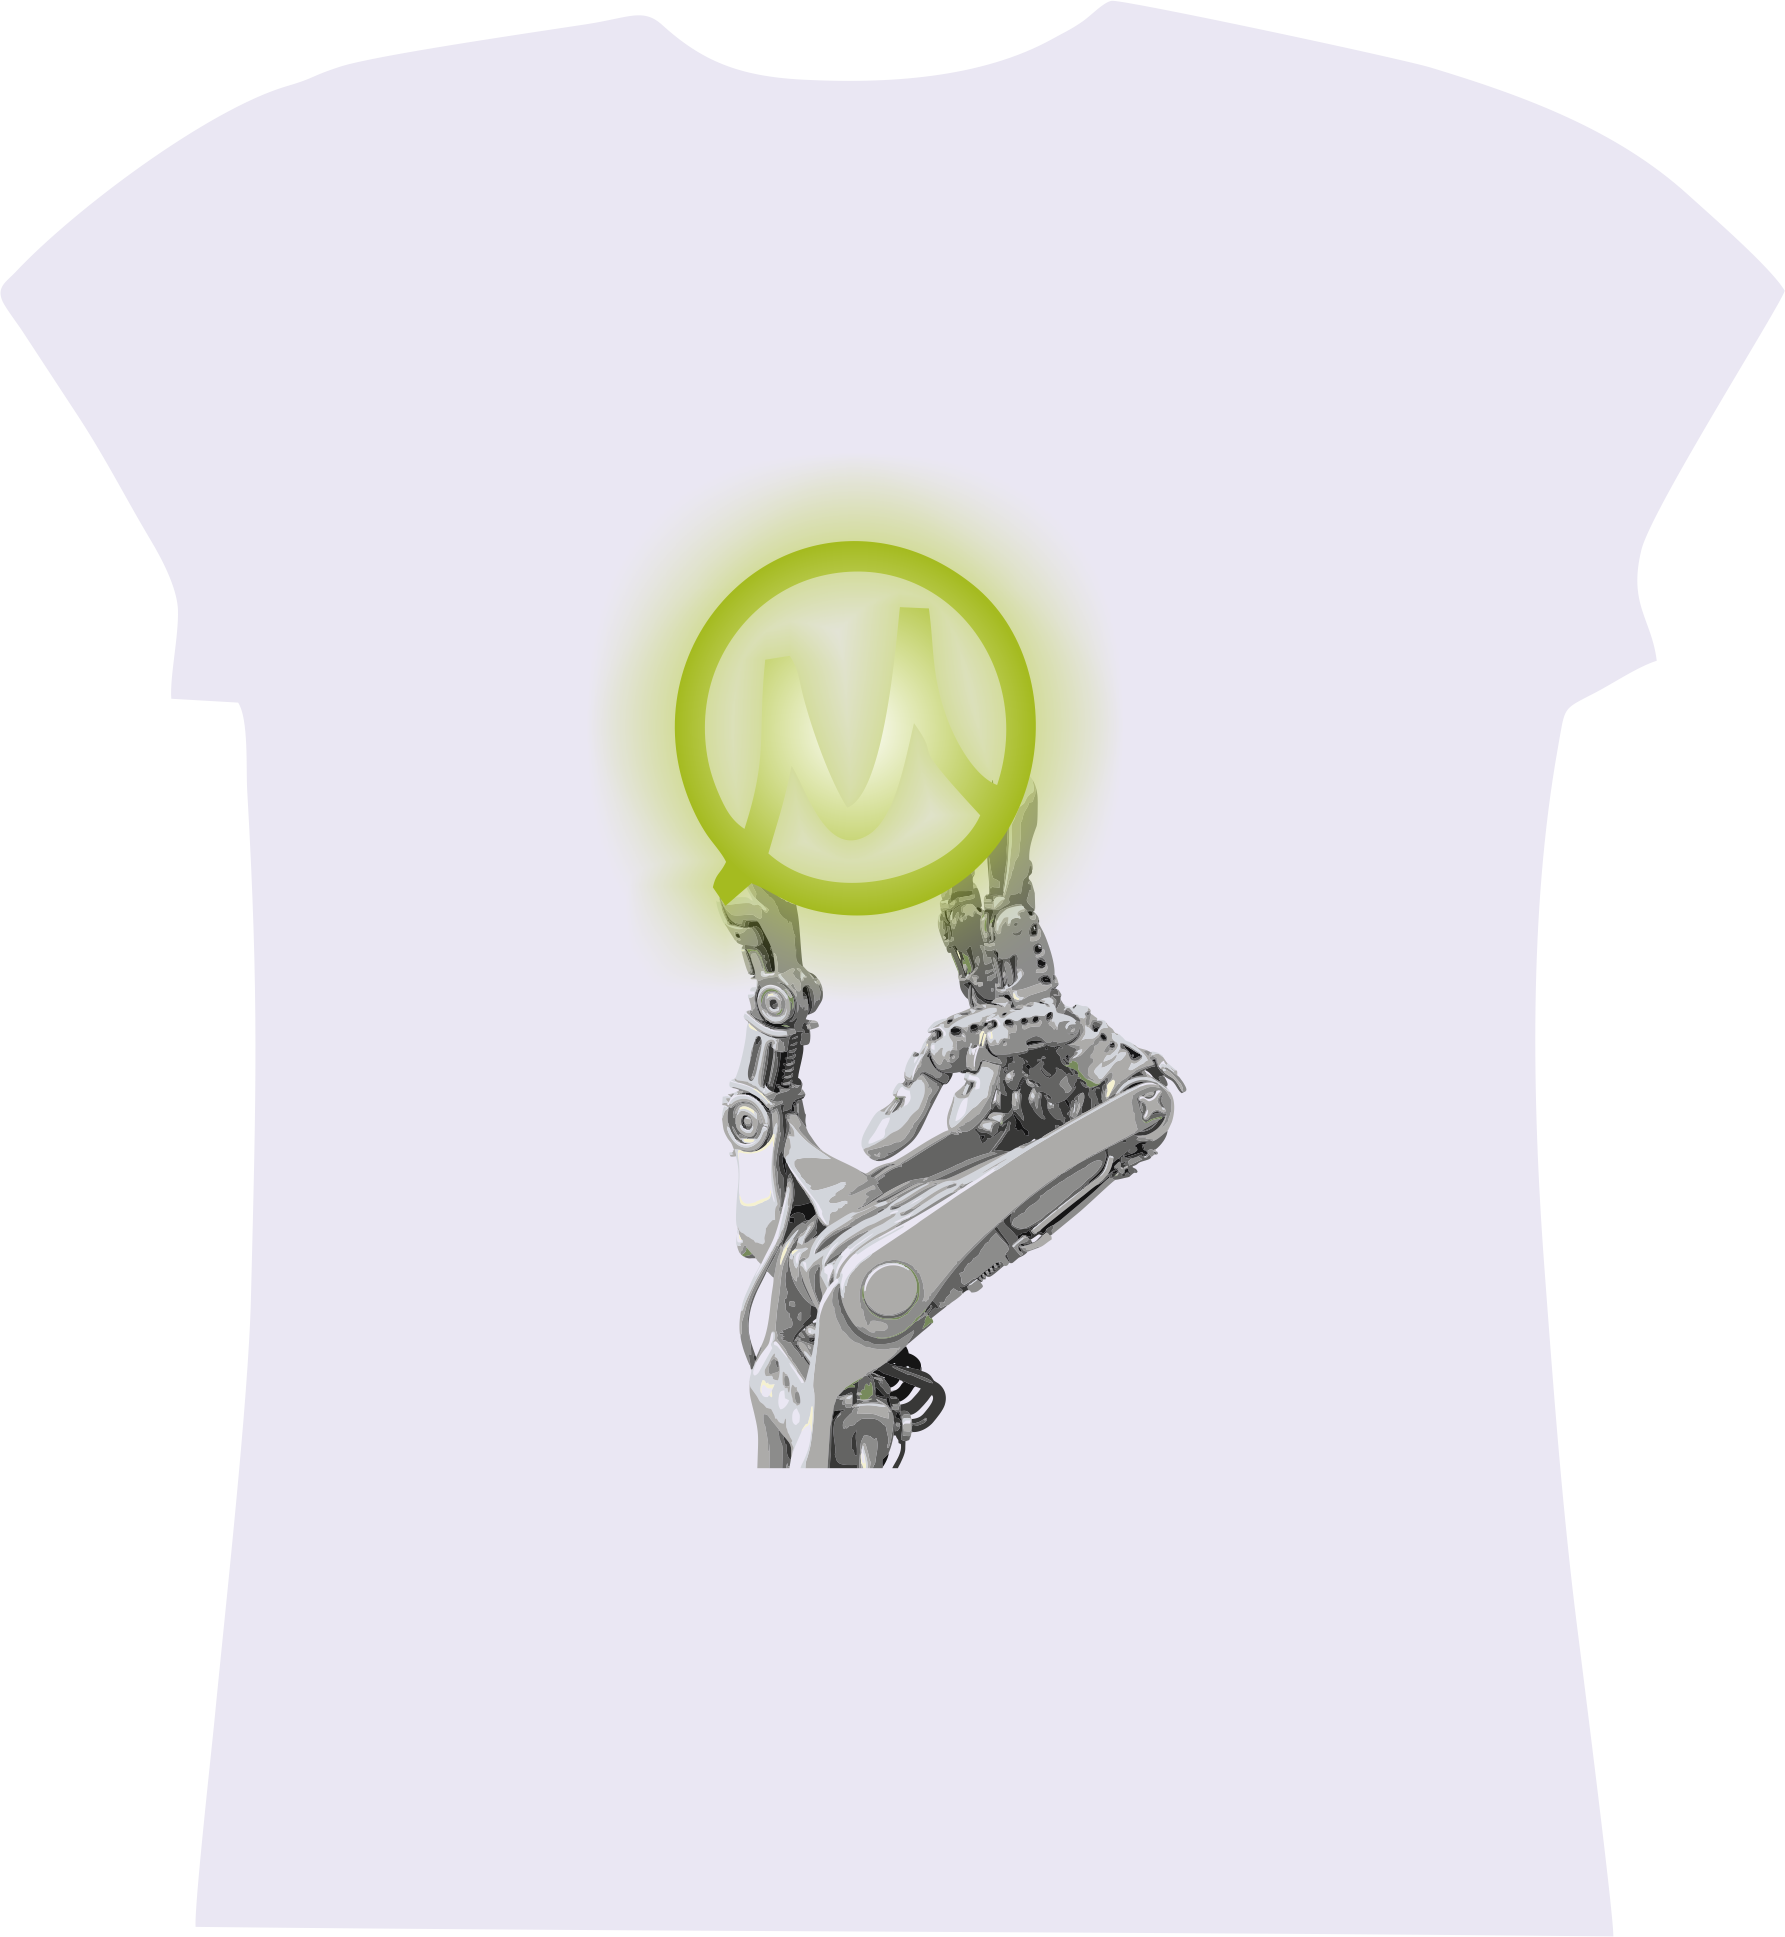 Нарисовать принты на футболки для компании Моторика фото f_665609ccc7eb55a2.png